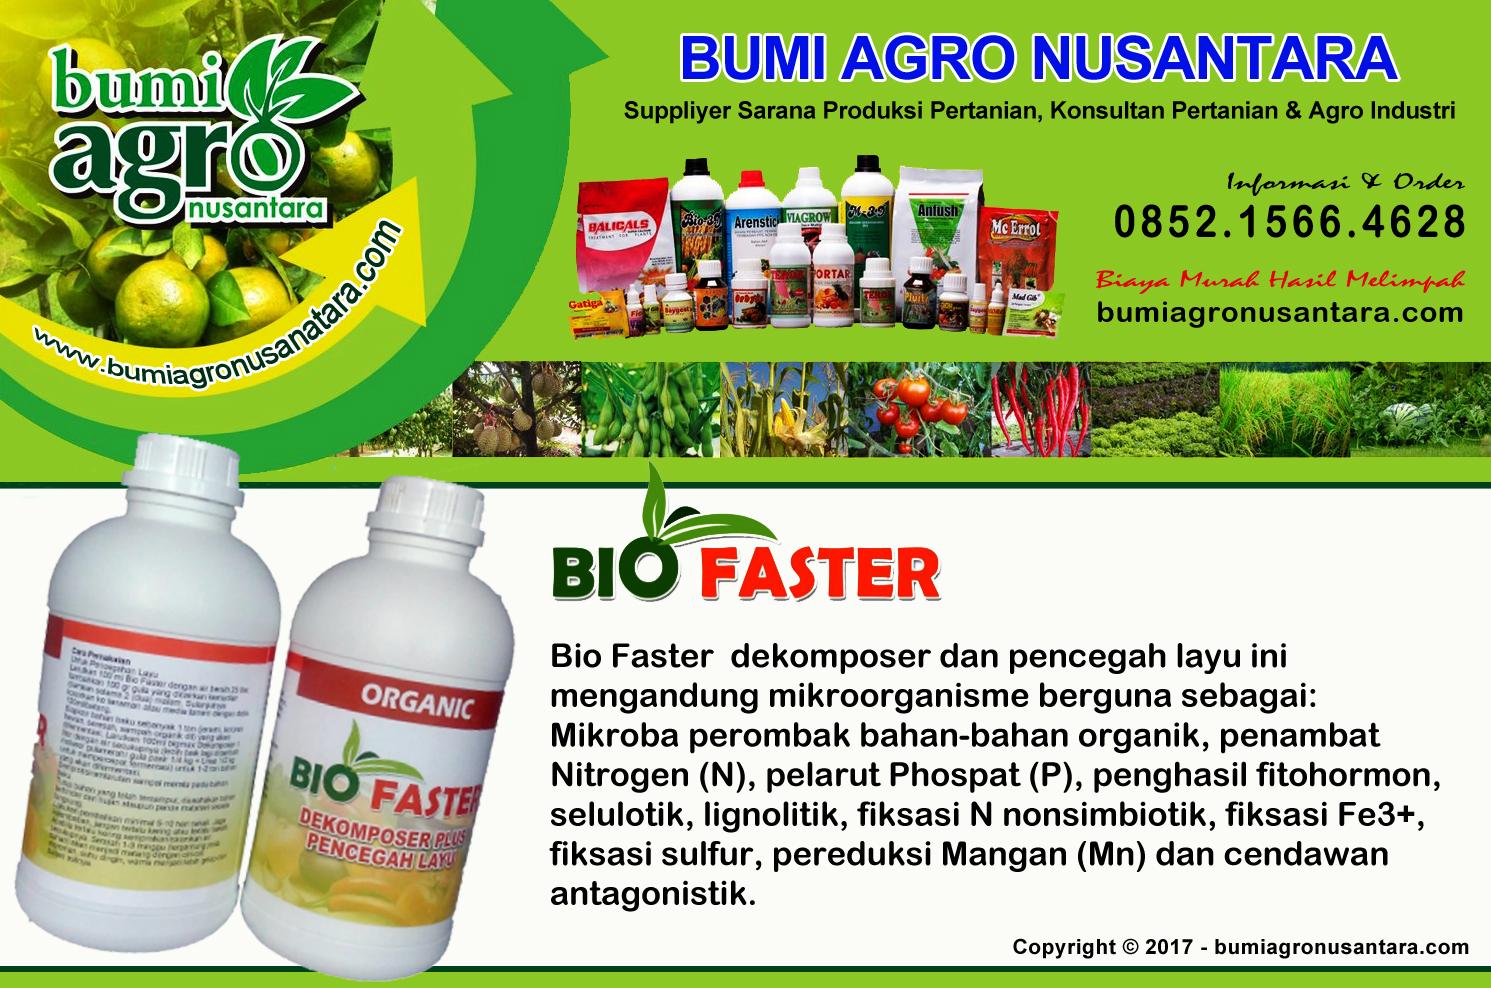 pupuk organik, bio faster, pupuk ramah lingkungan, bum agro nusantara,